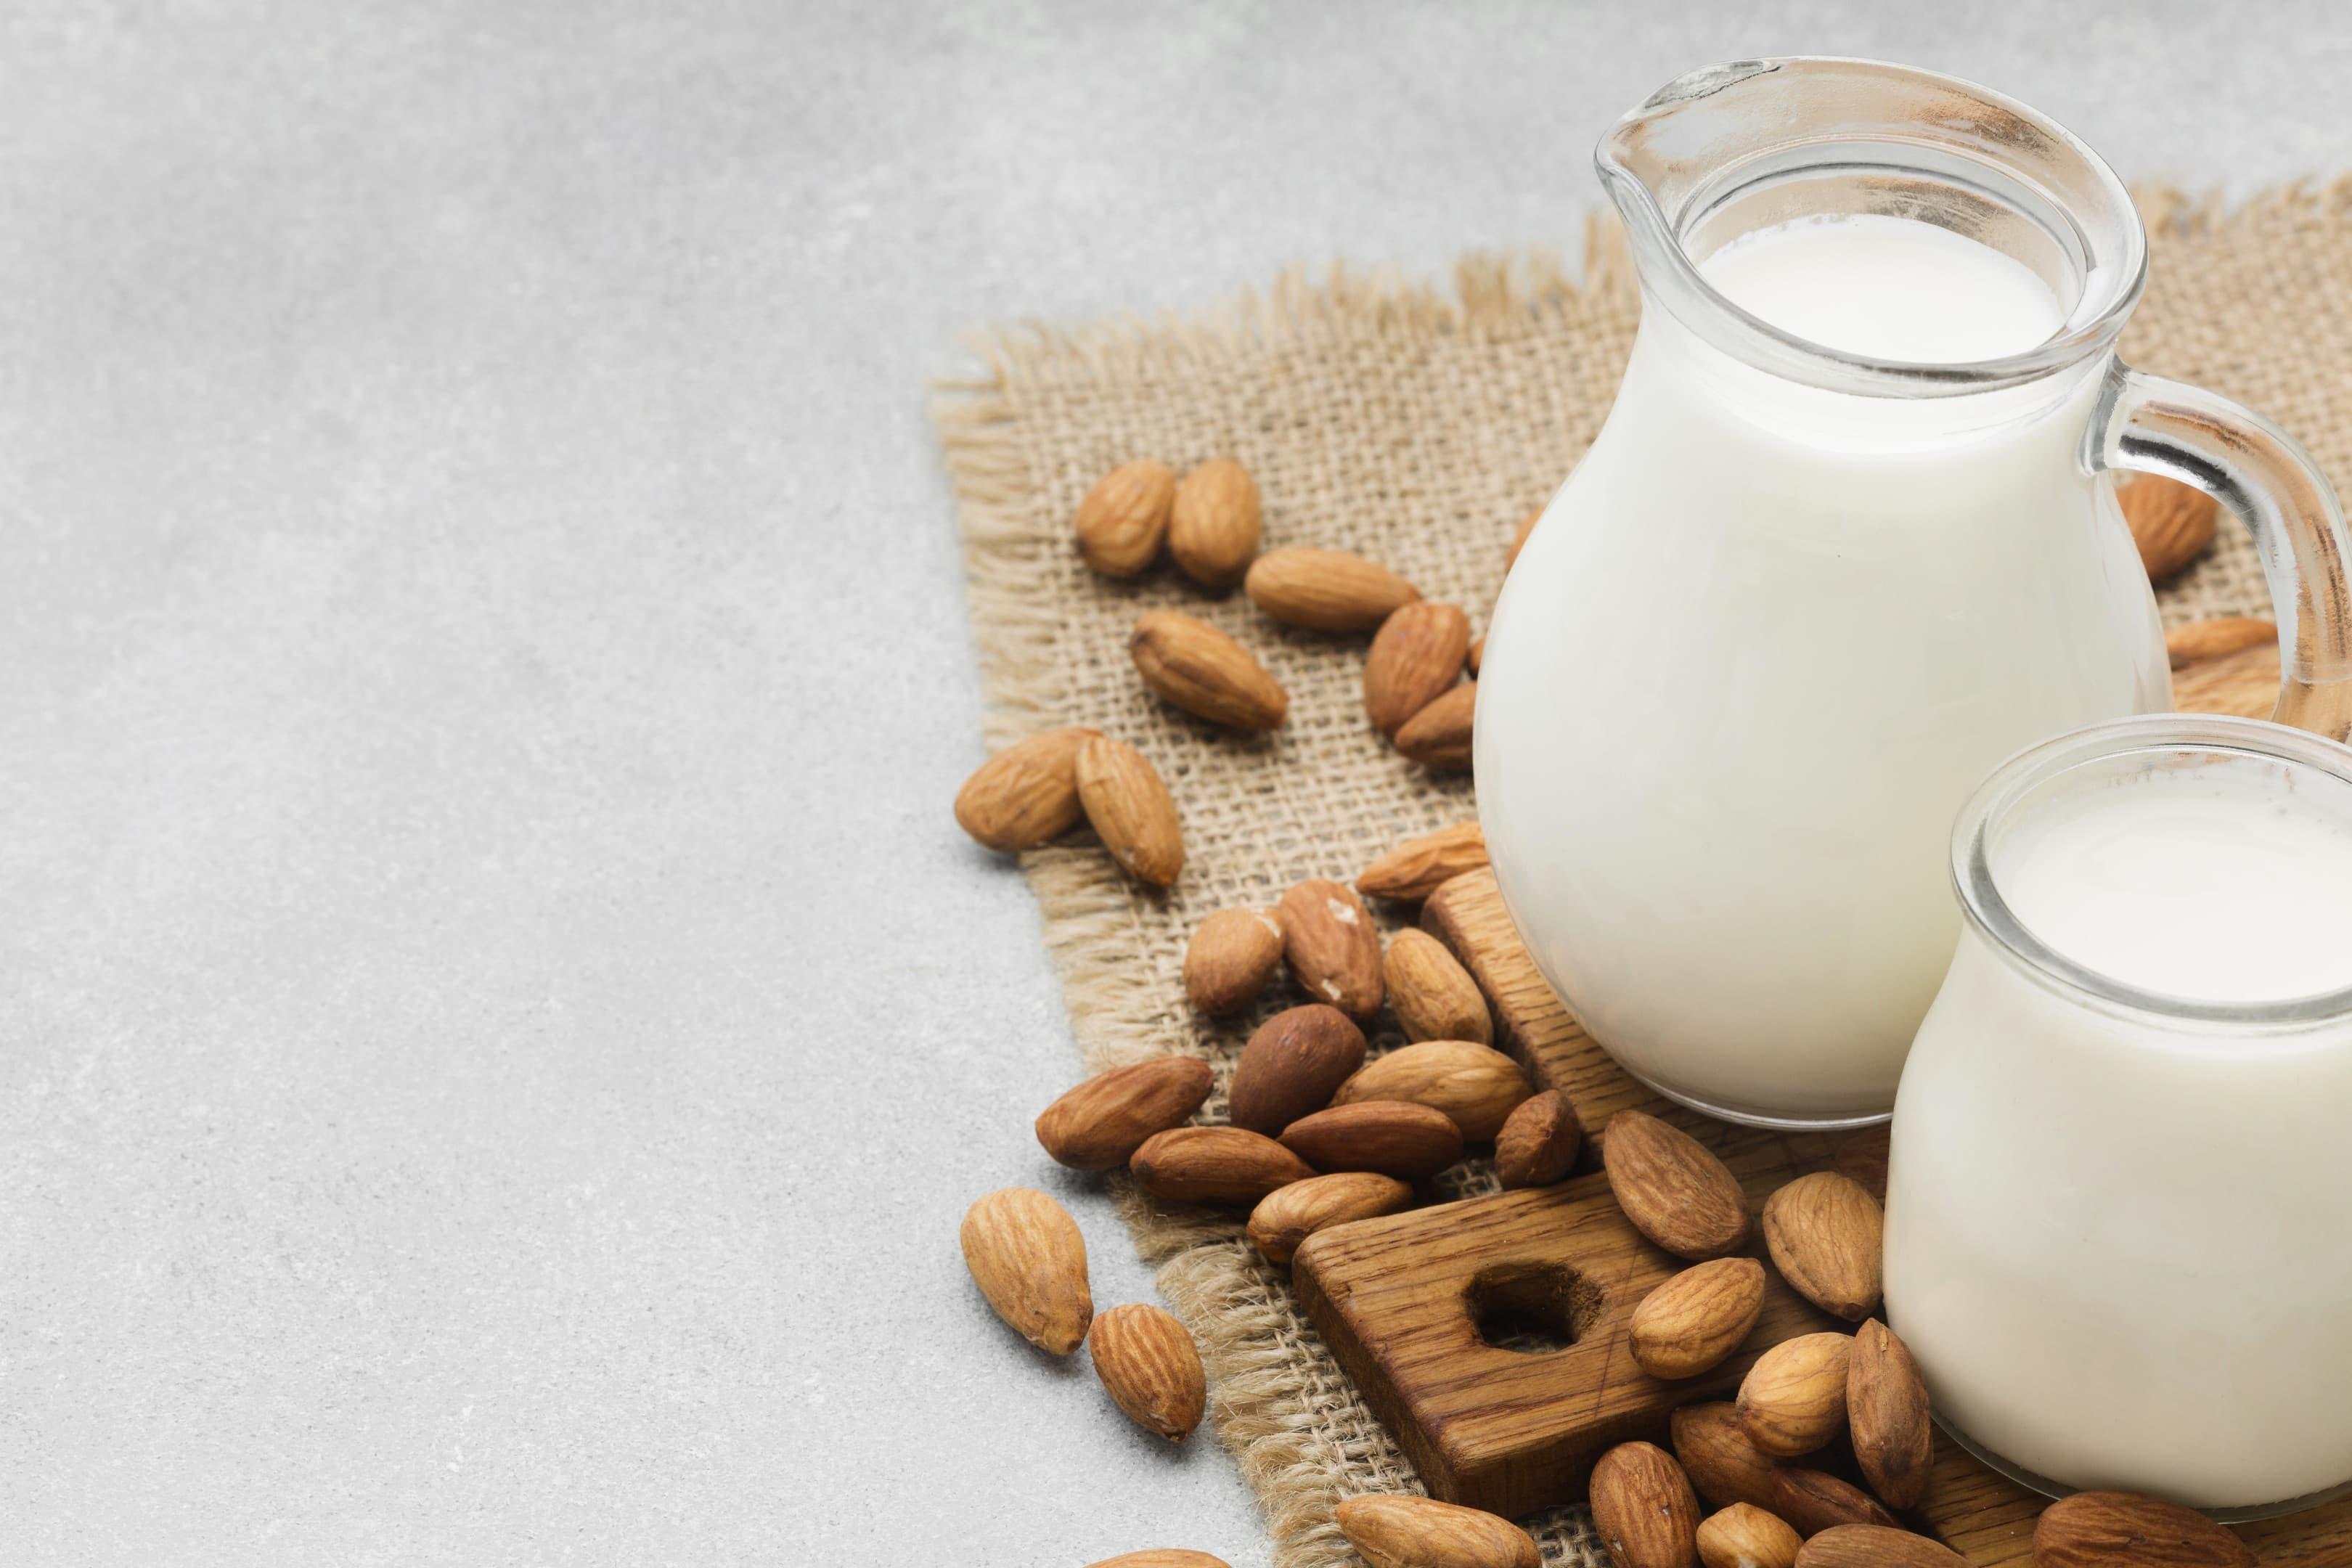 Fresh almond milk with almonds on white table